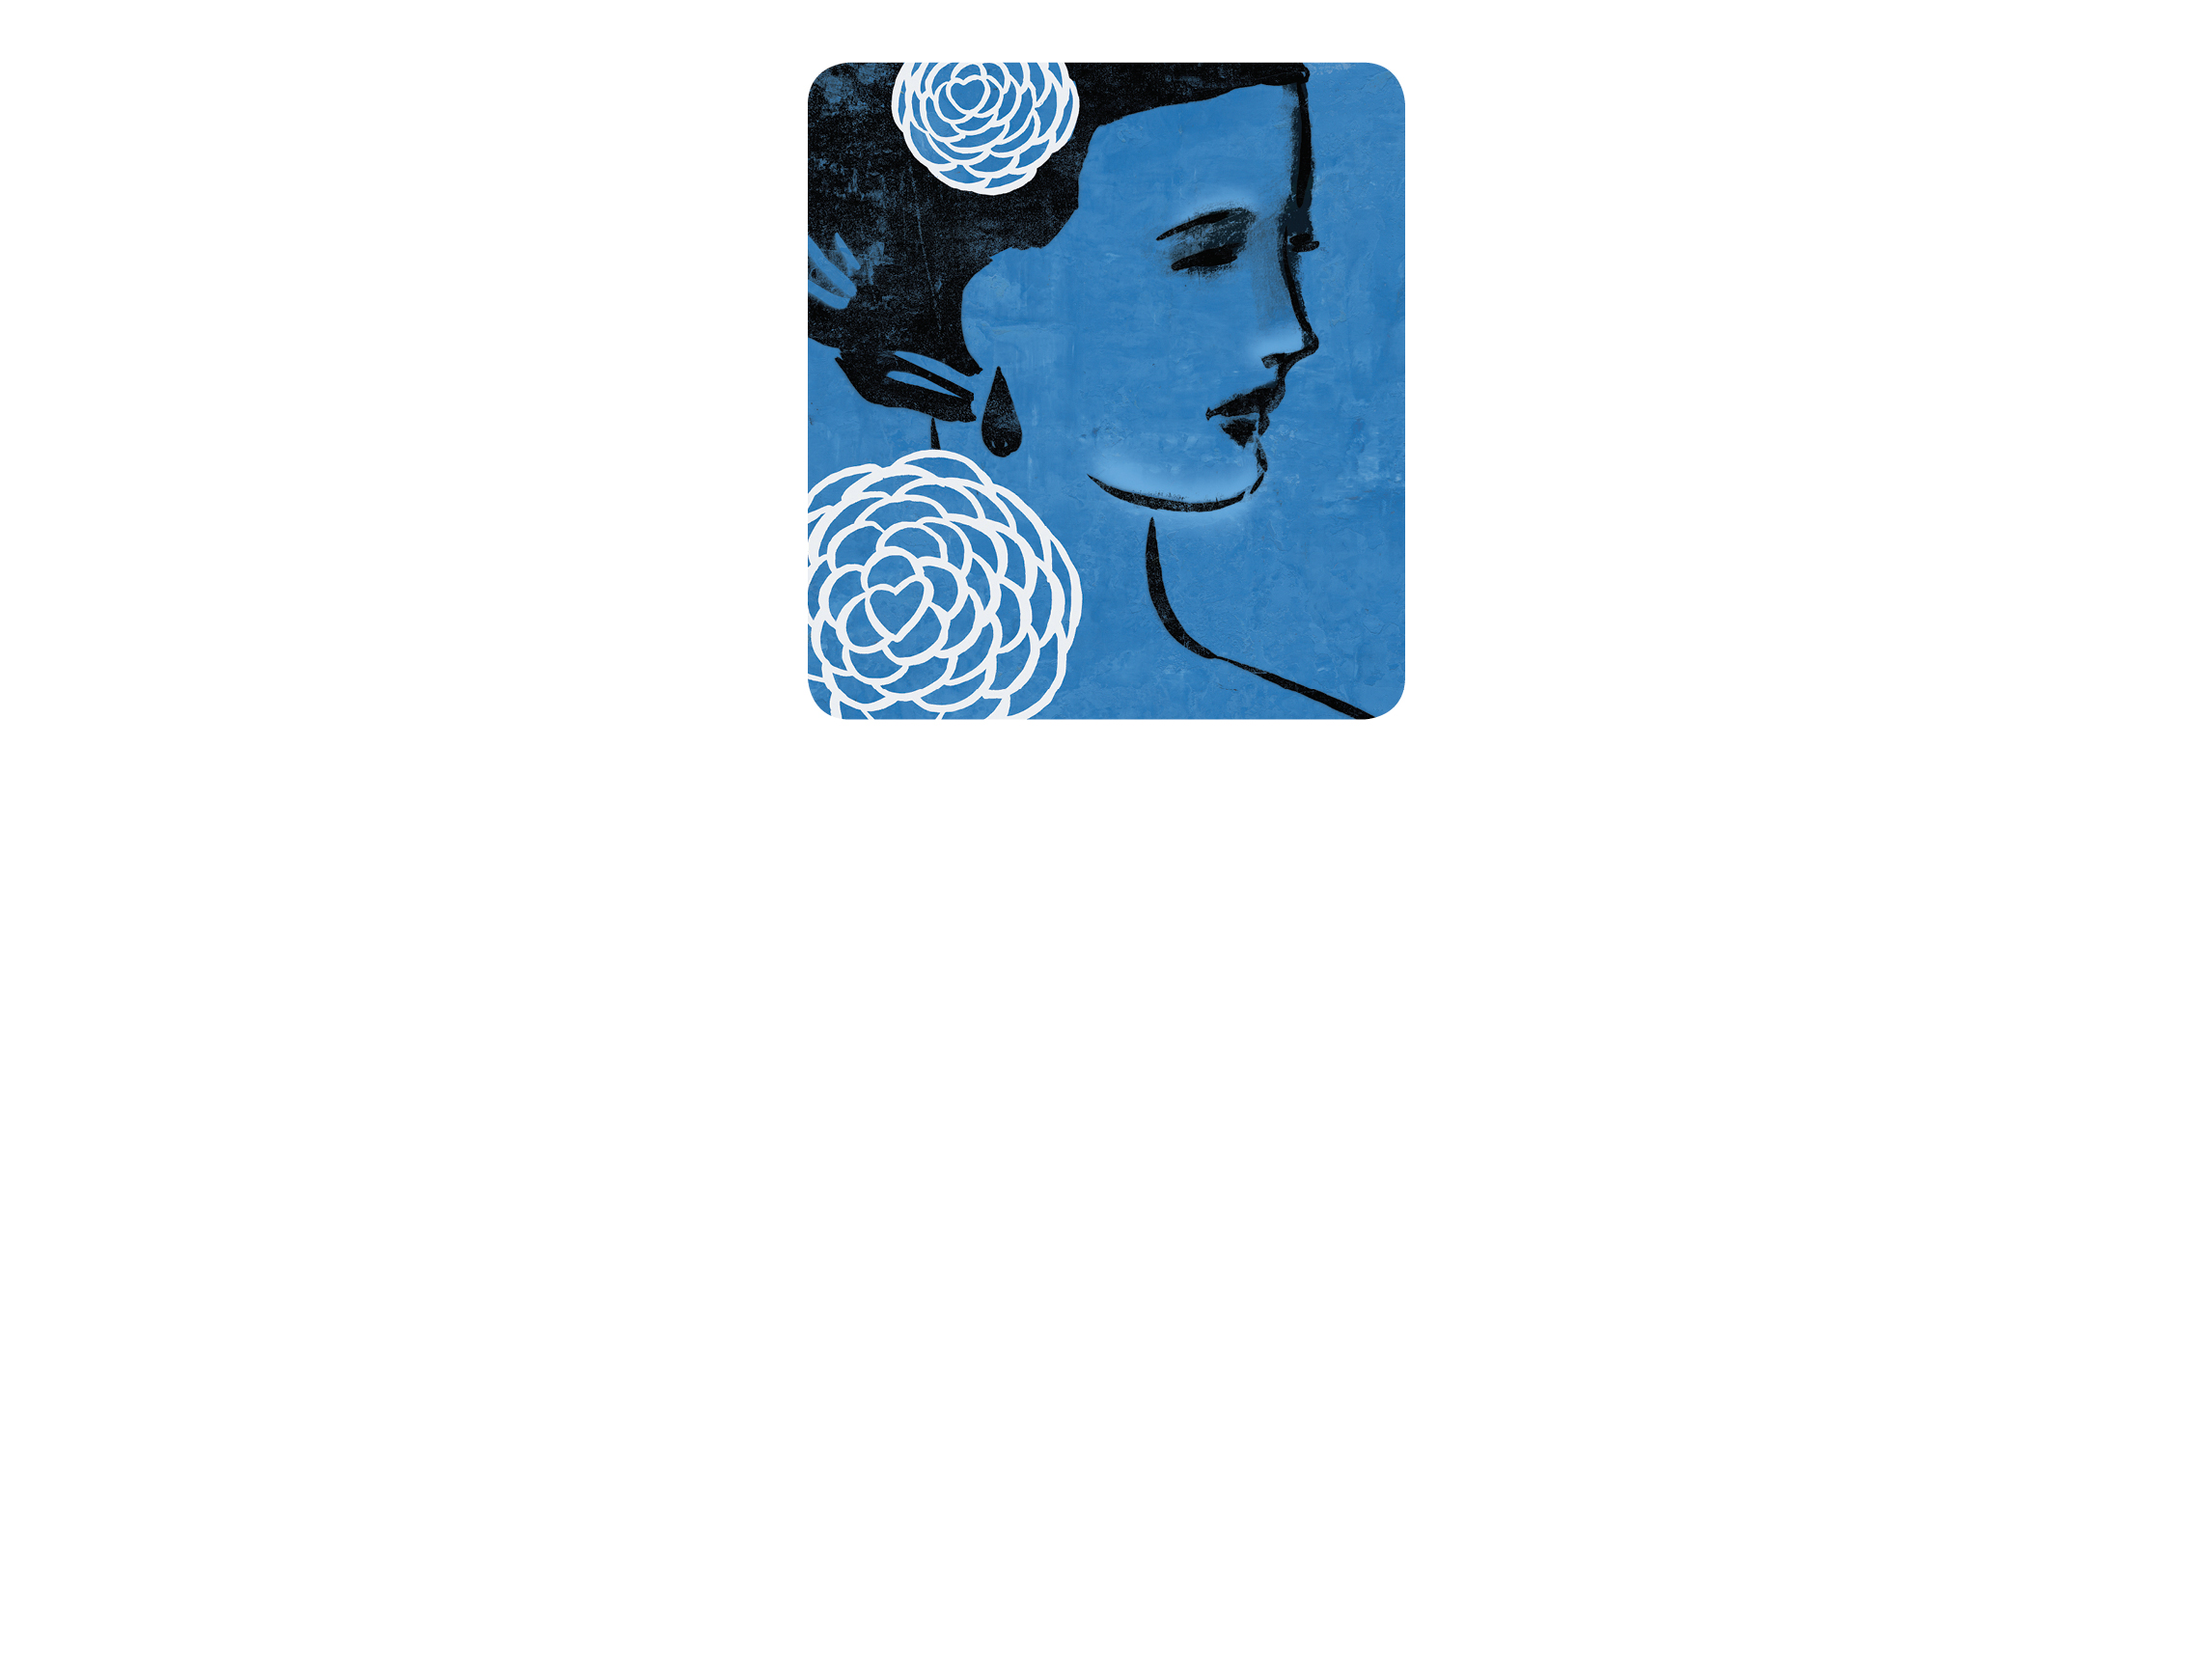 DMD_Logos_CHEVOO Blue Lady_150.jpg